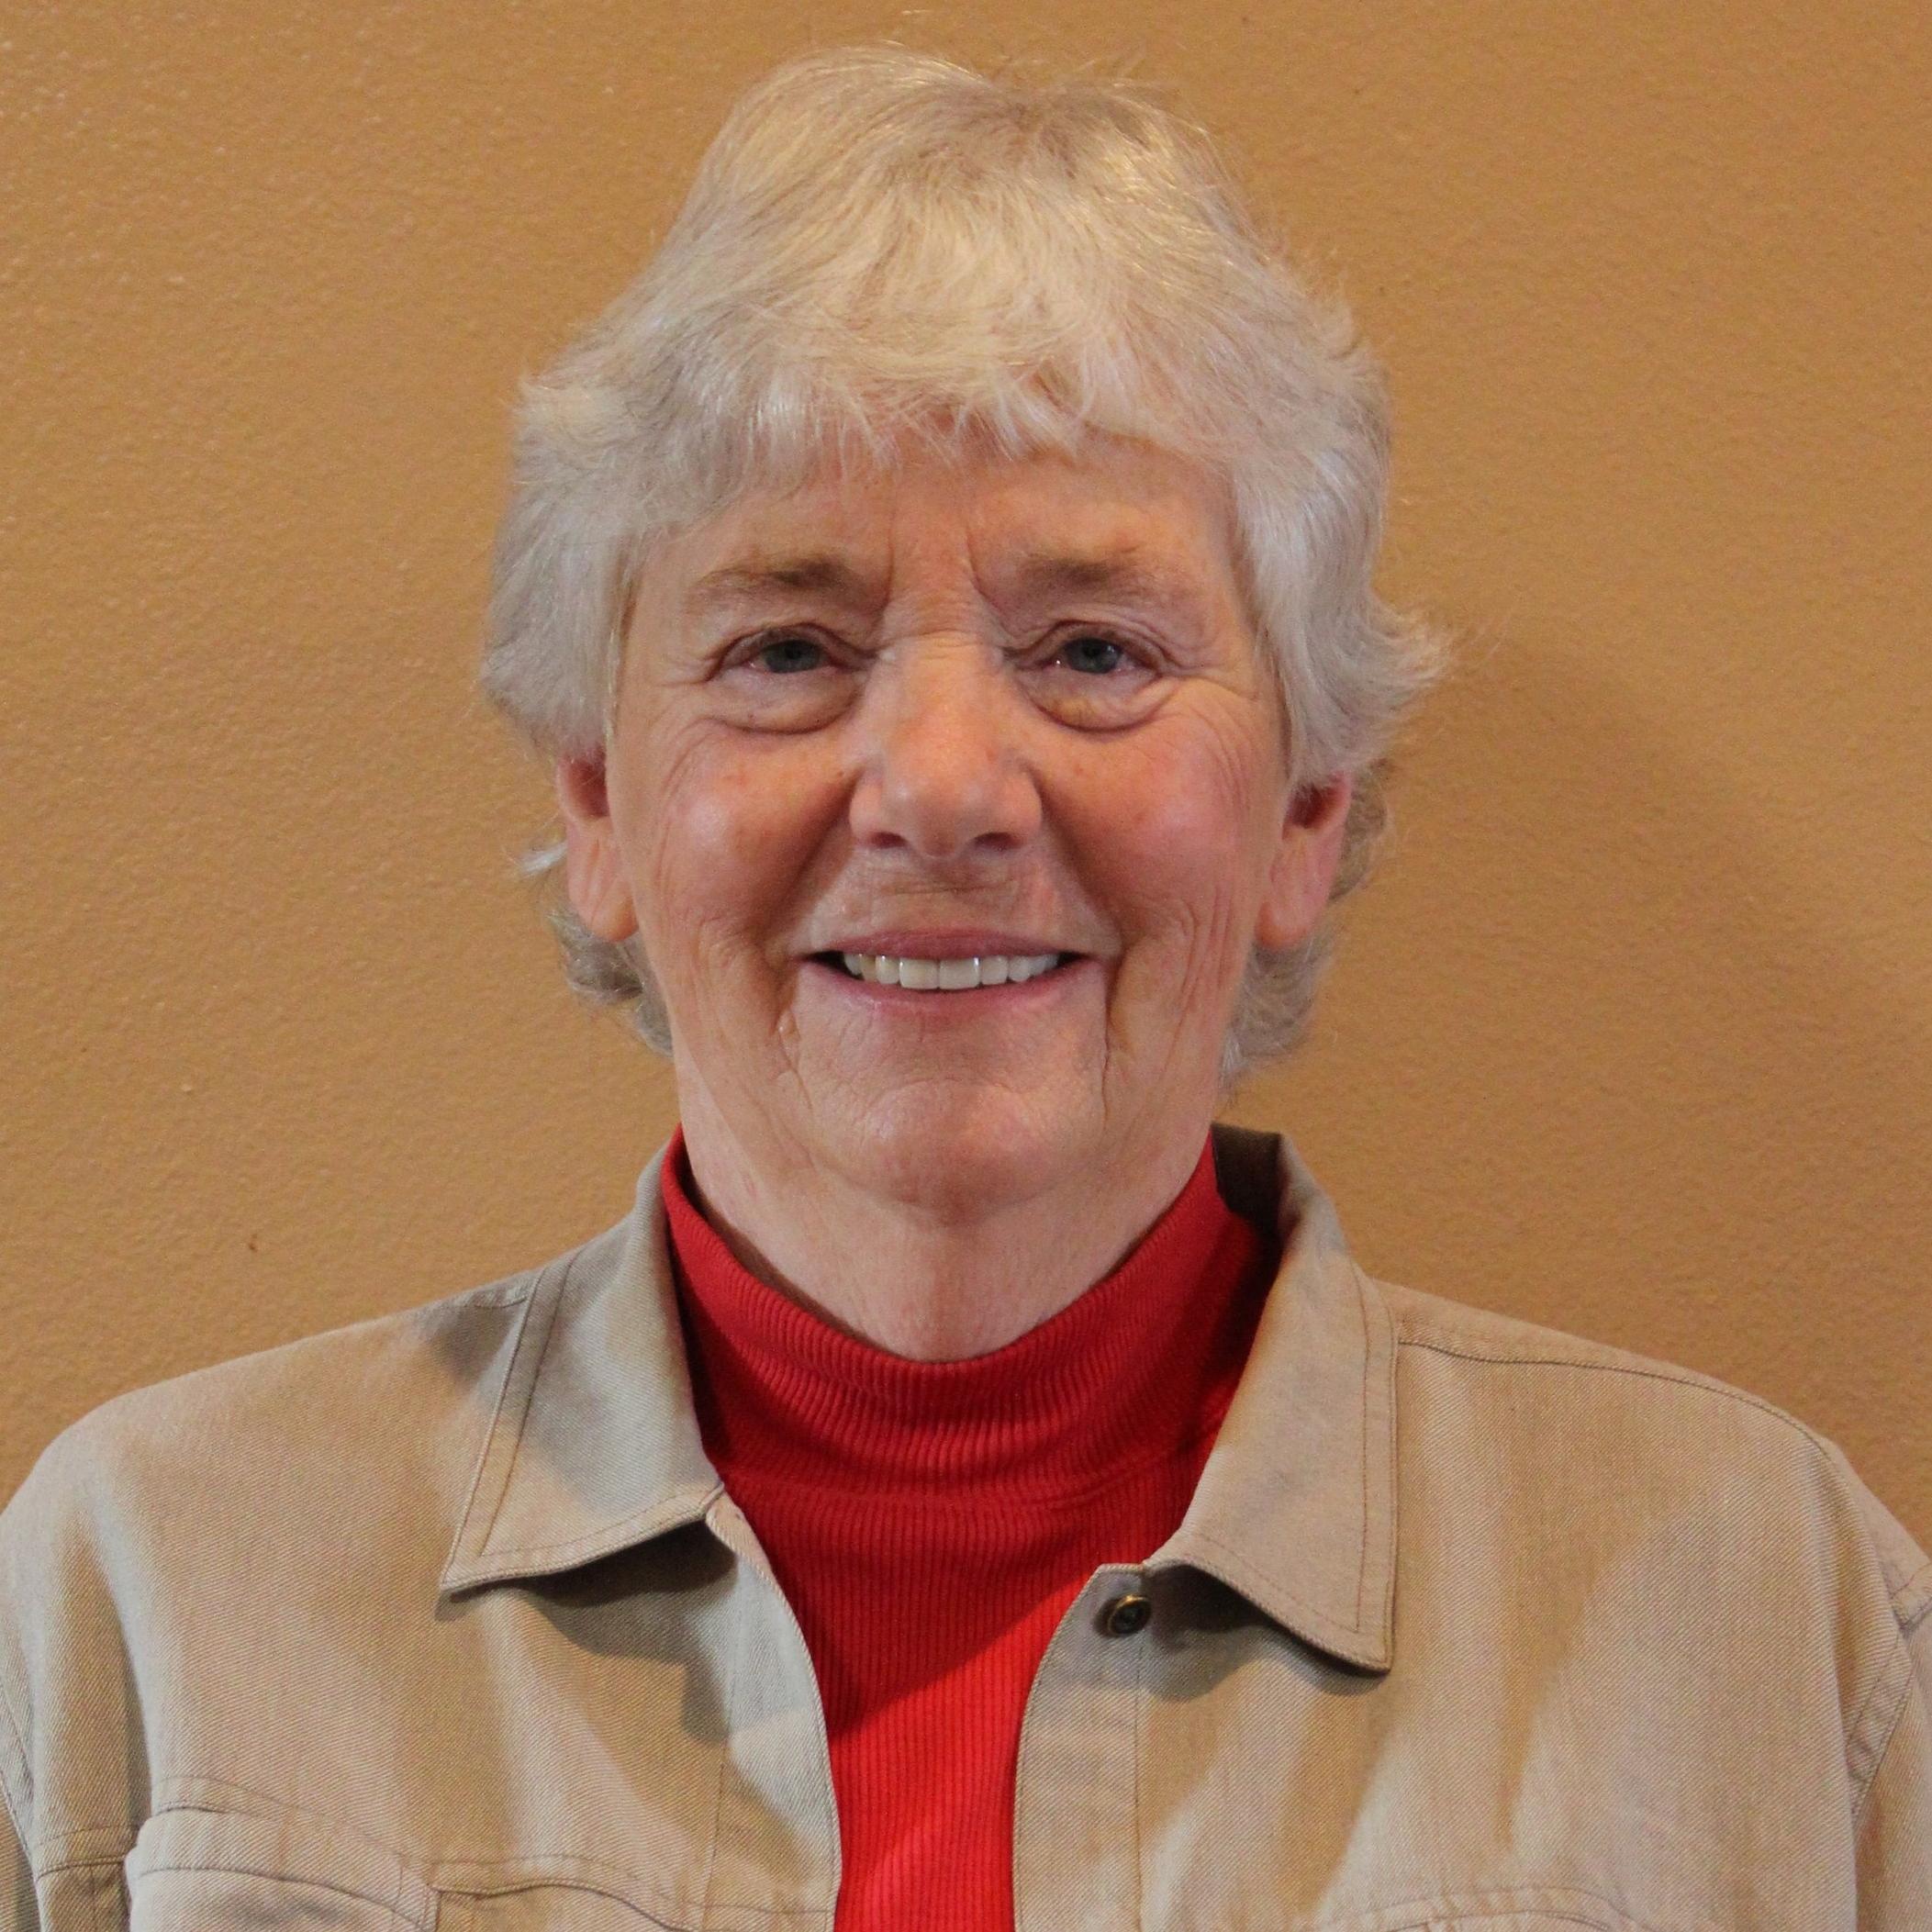 Linda Harrel, Children's Ministry